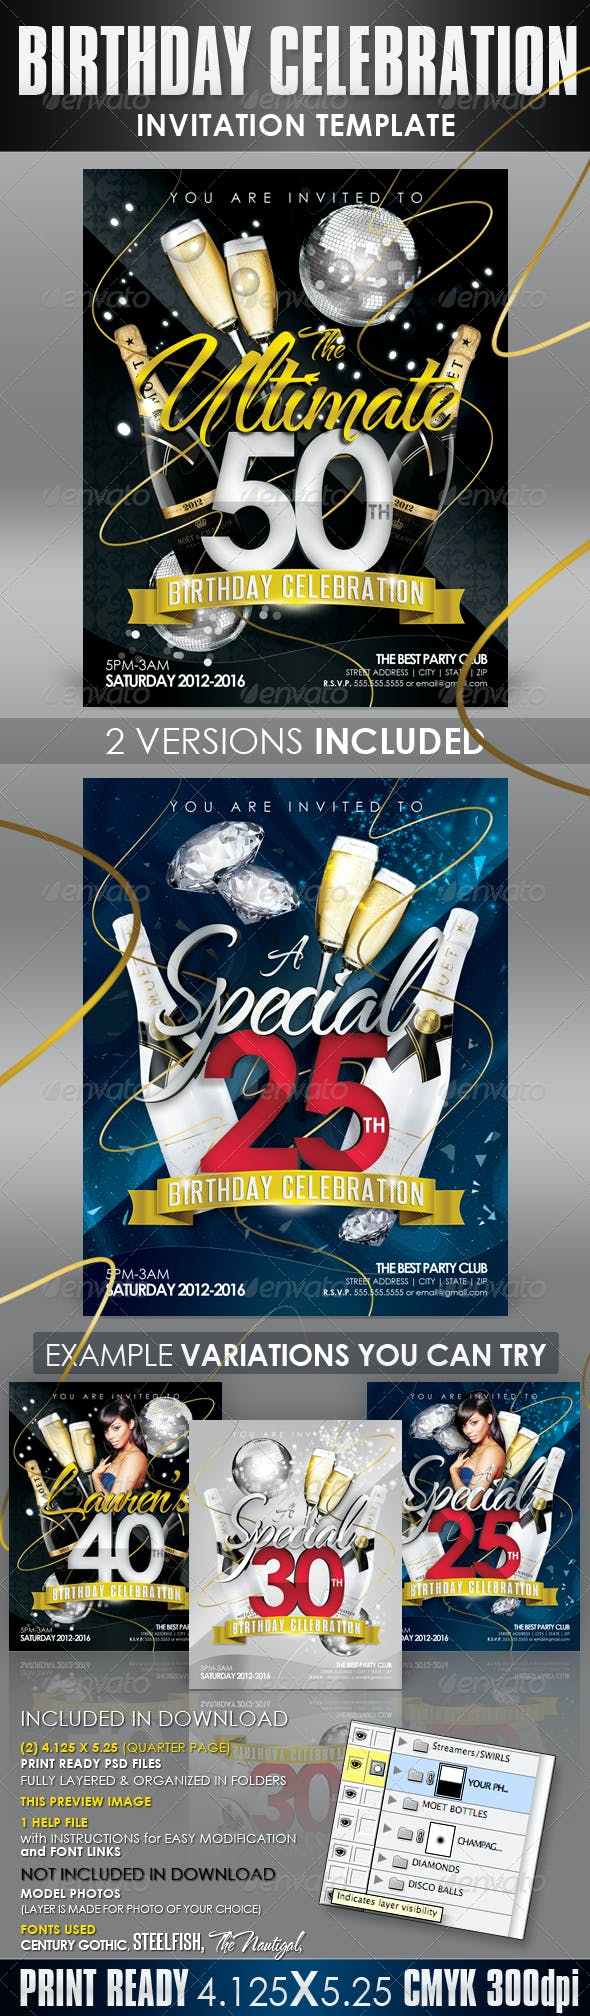 birthday invitation templates club flyer style by creativb